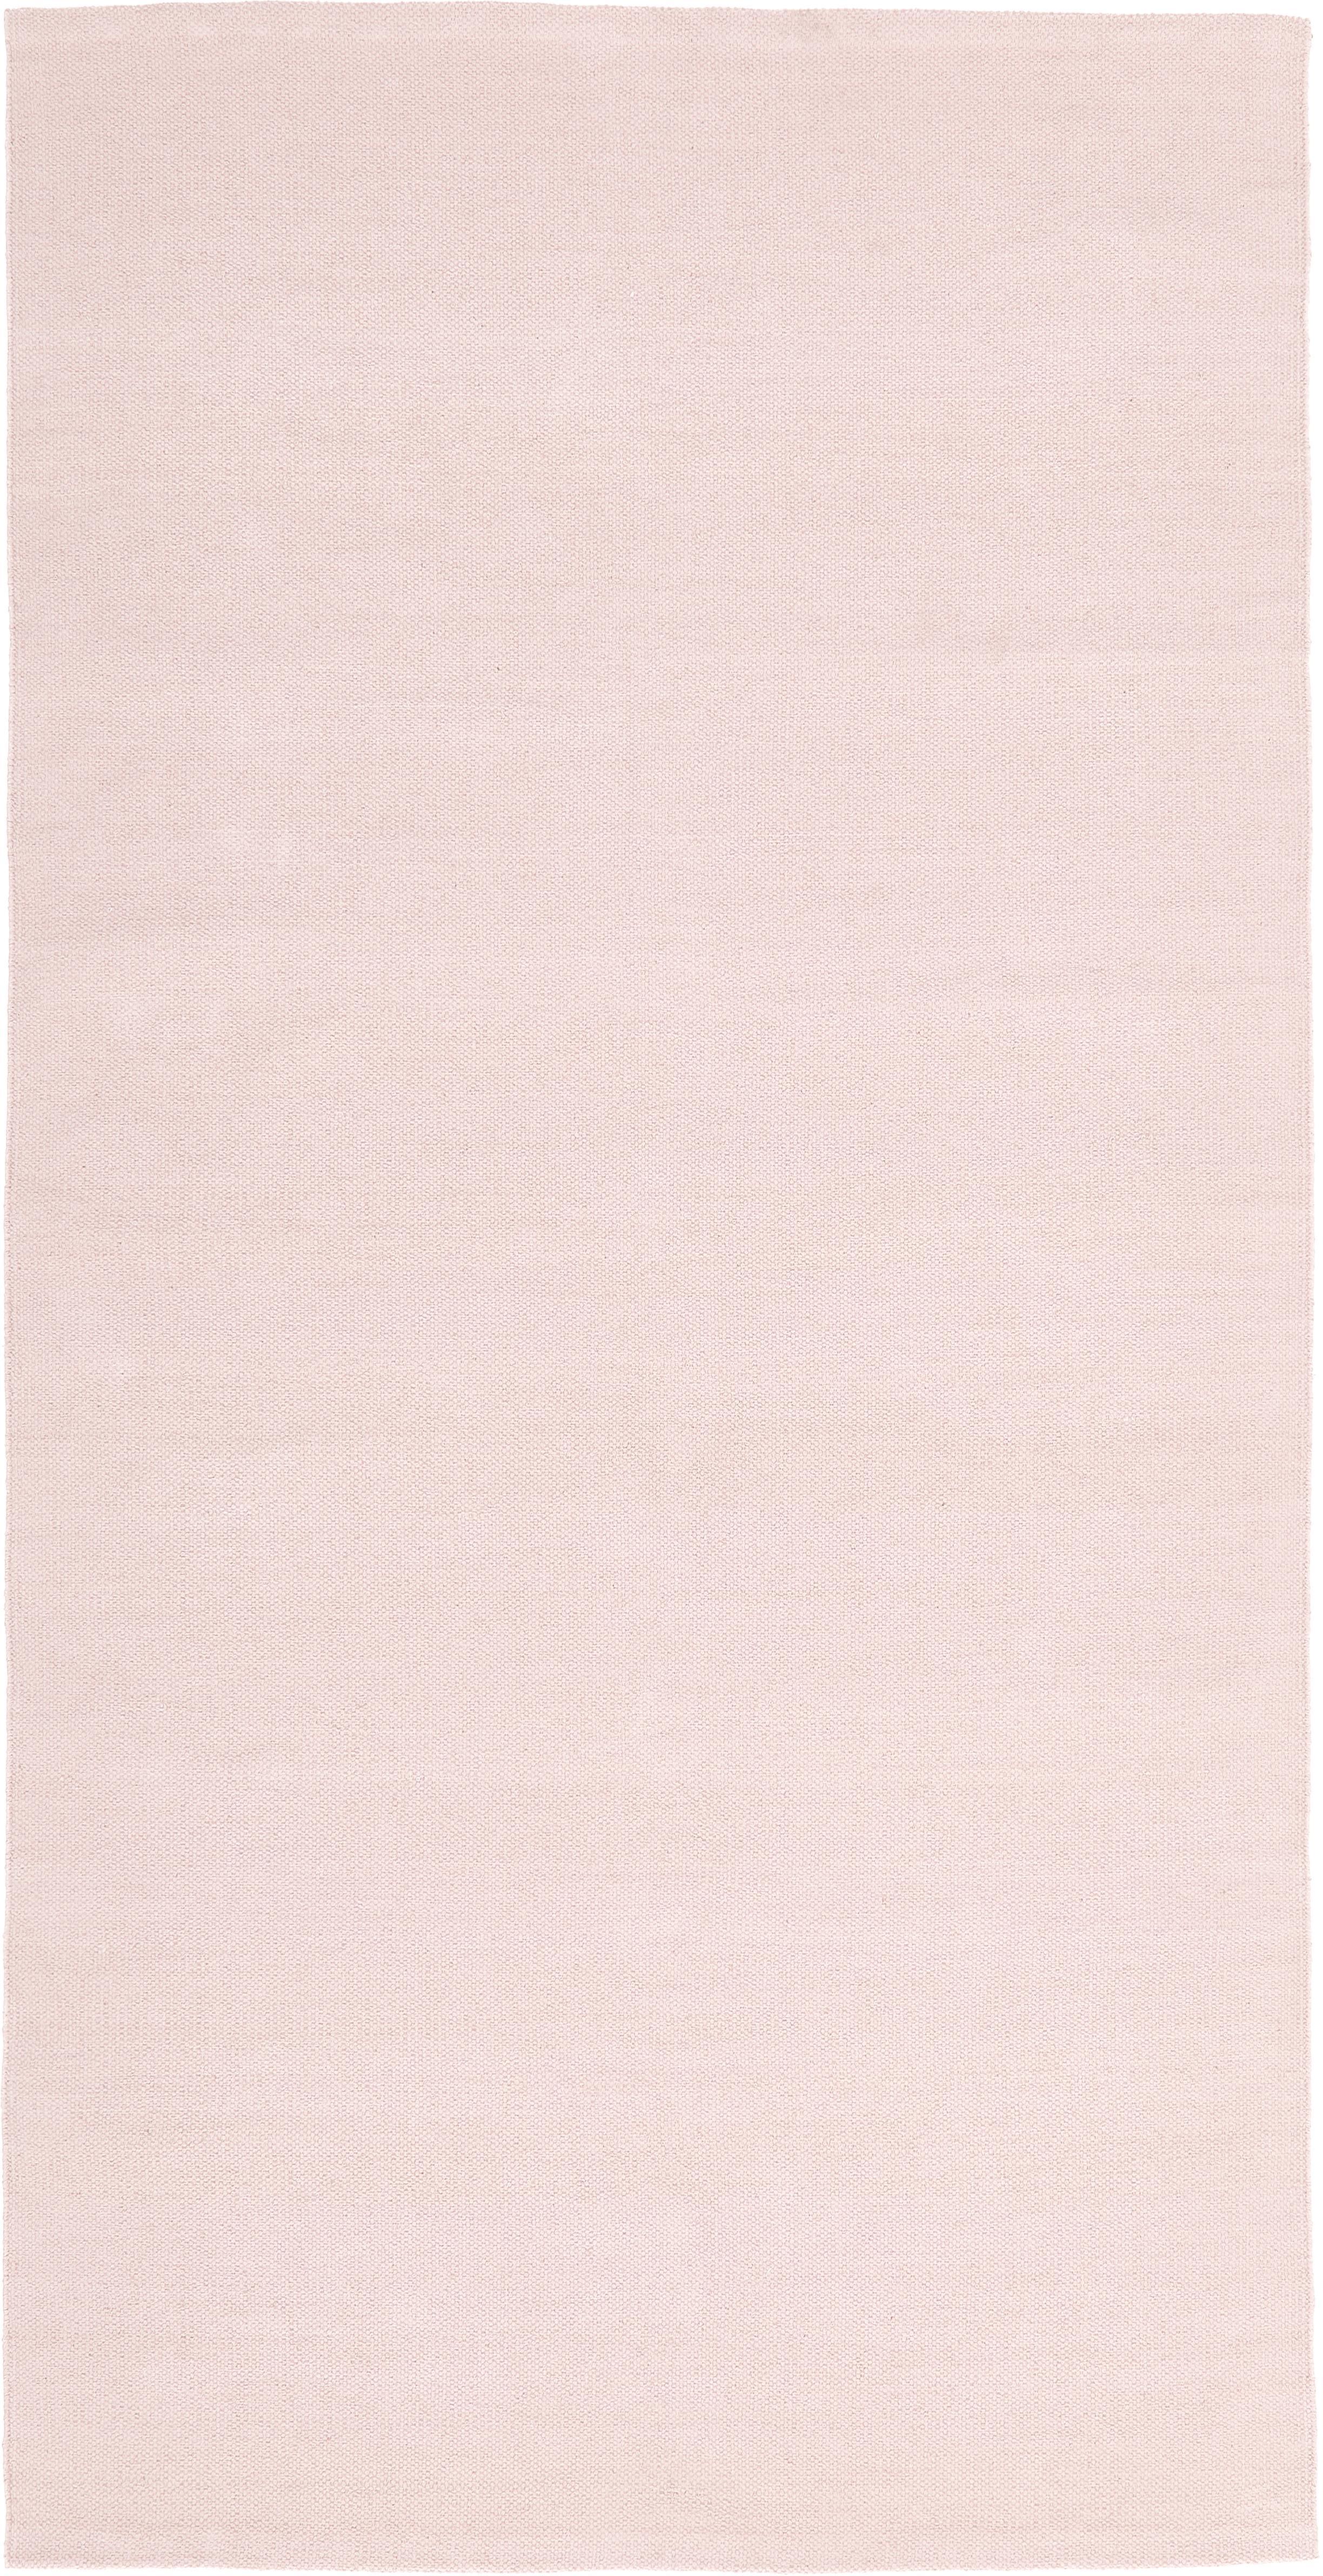 Dünner Baumwollteppich Agneta, handgewebt, 100% Baumwolle, Rosa, B 70 x L 140 cm (Grösse XS)